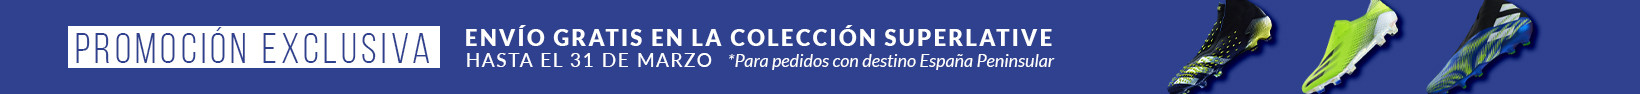 adidas_superlative_envios_barrita_ES.jpg